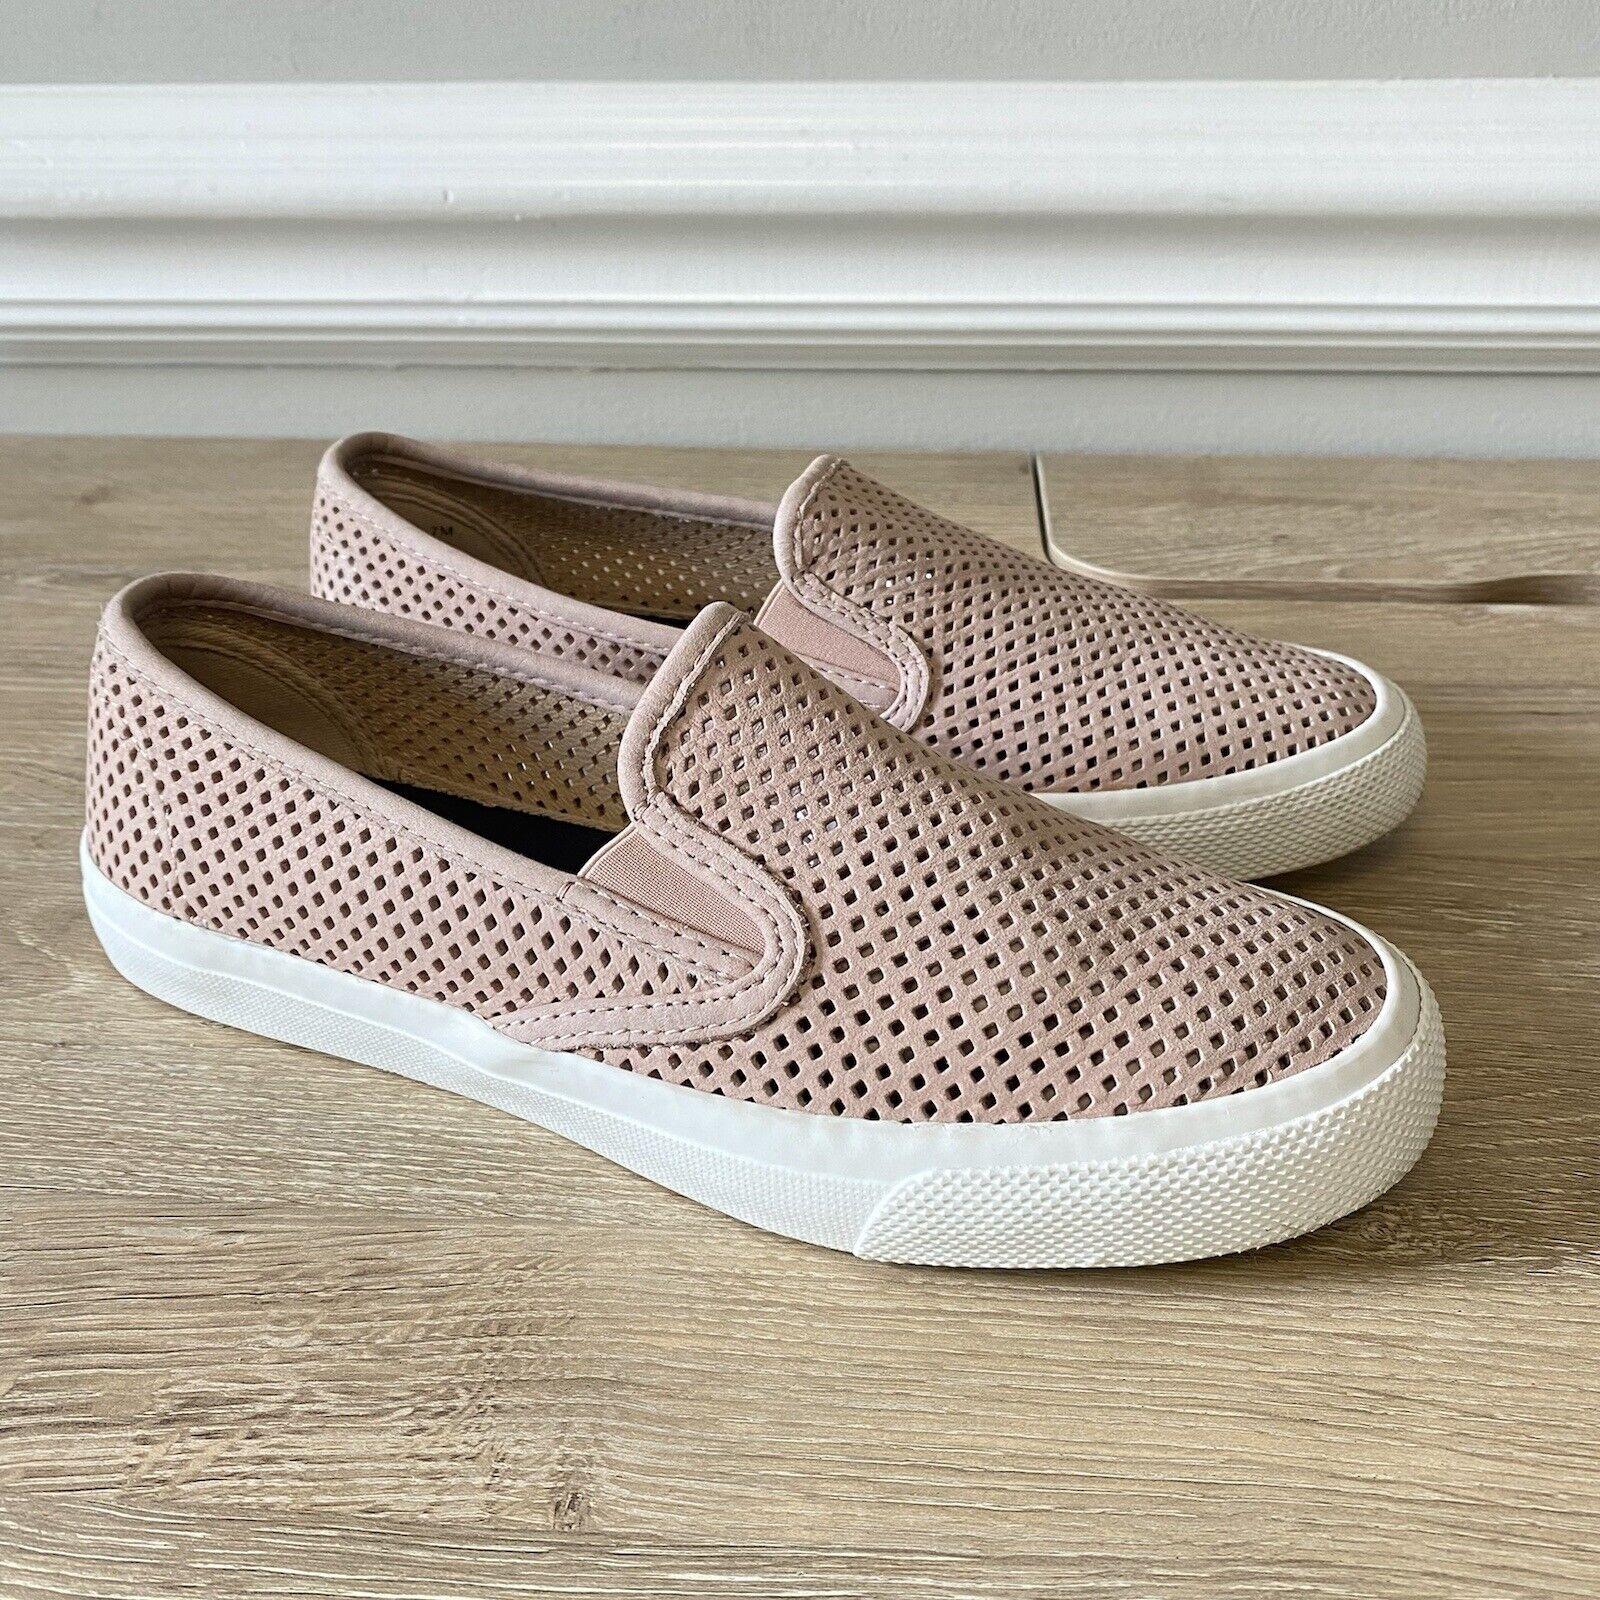 Sperry Women's Seaside Perf Nude/Rose Leather Slip-on Sneaker Size 7 M